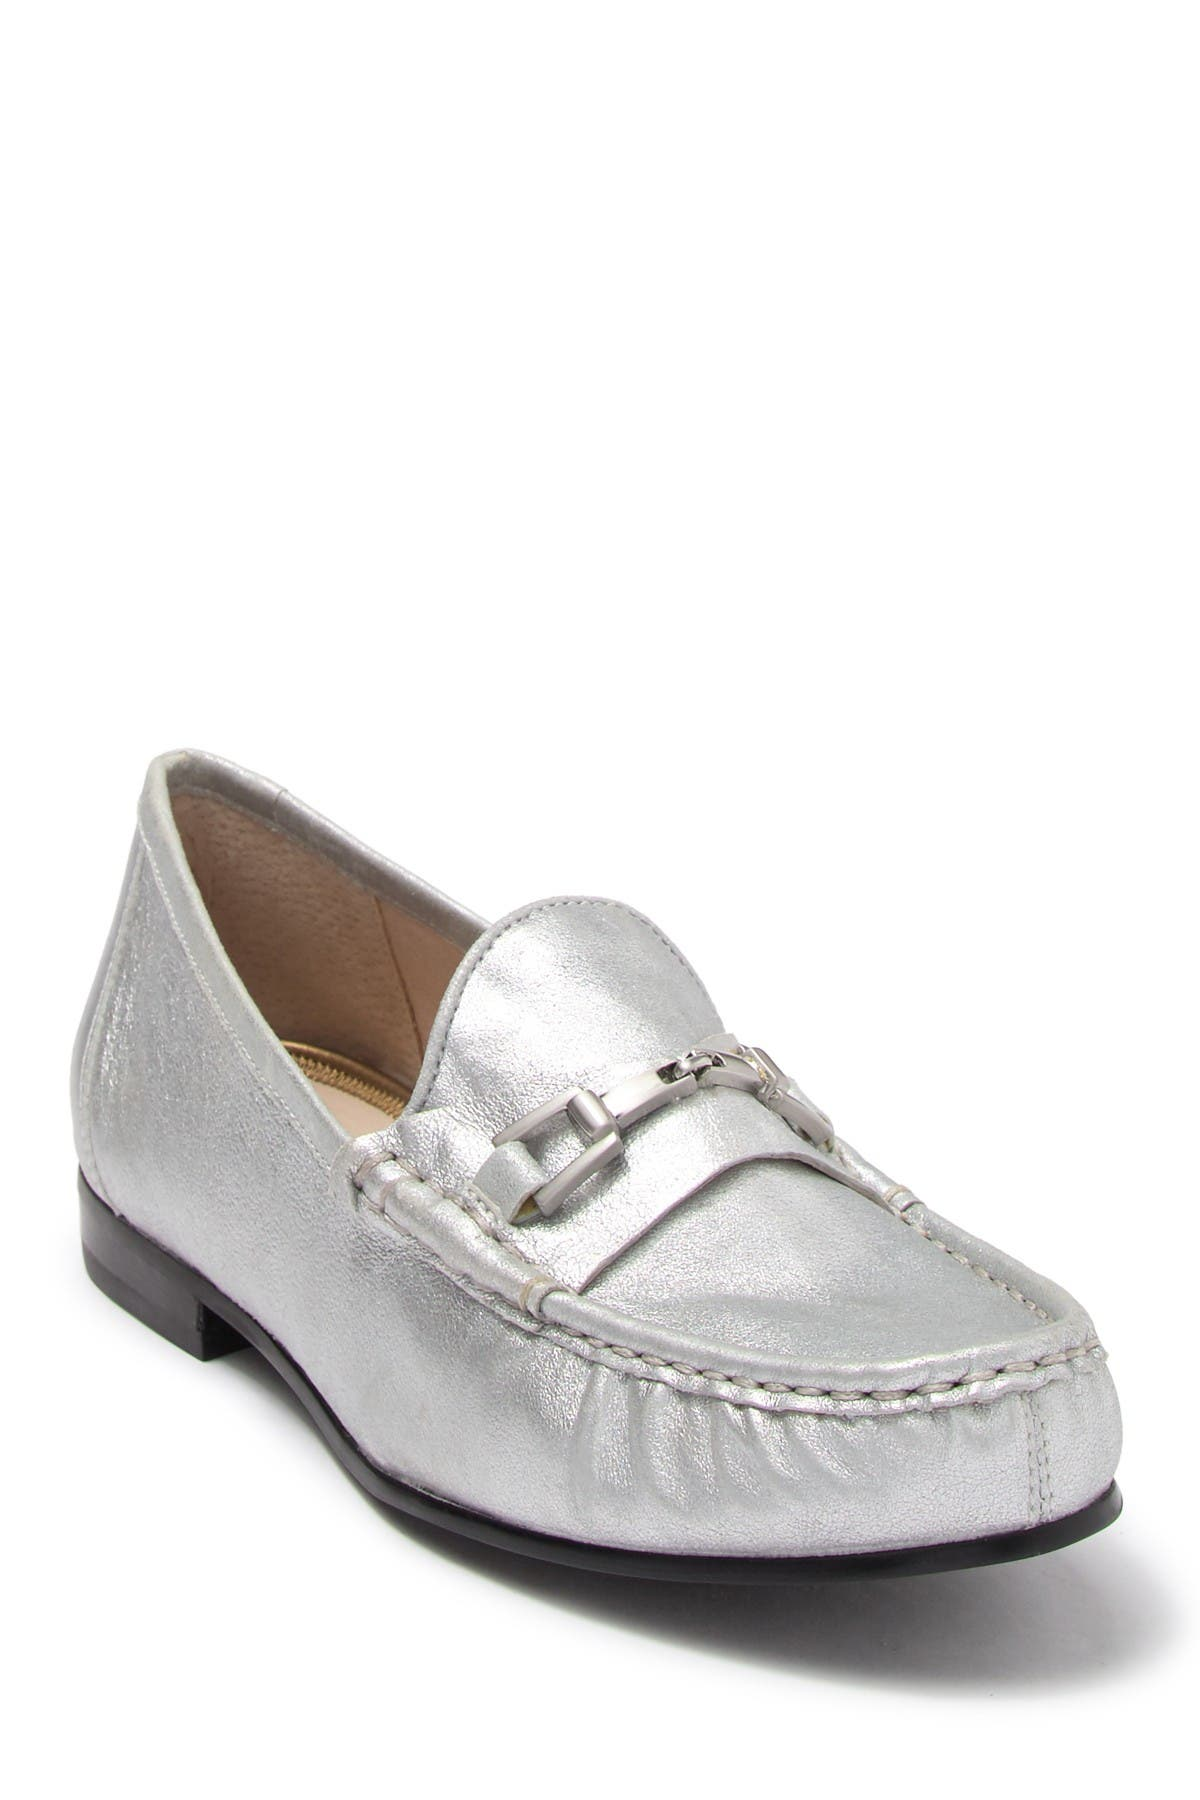 Sam Edelman   Tracey Leather Bit Loafer